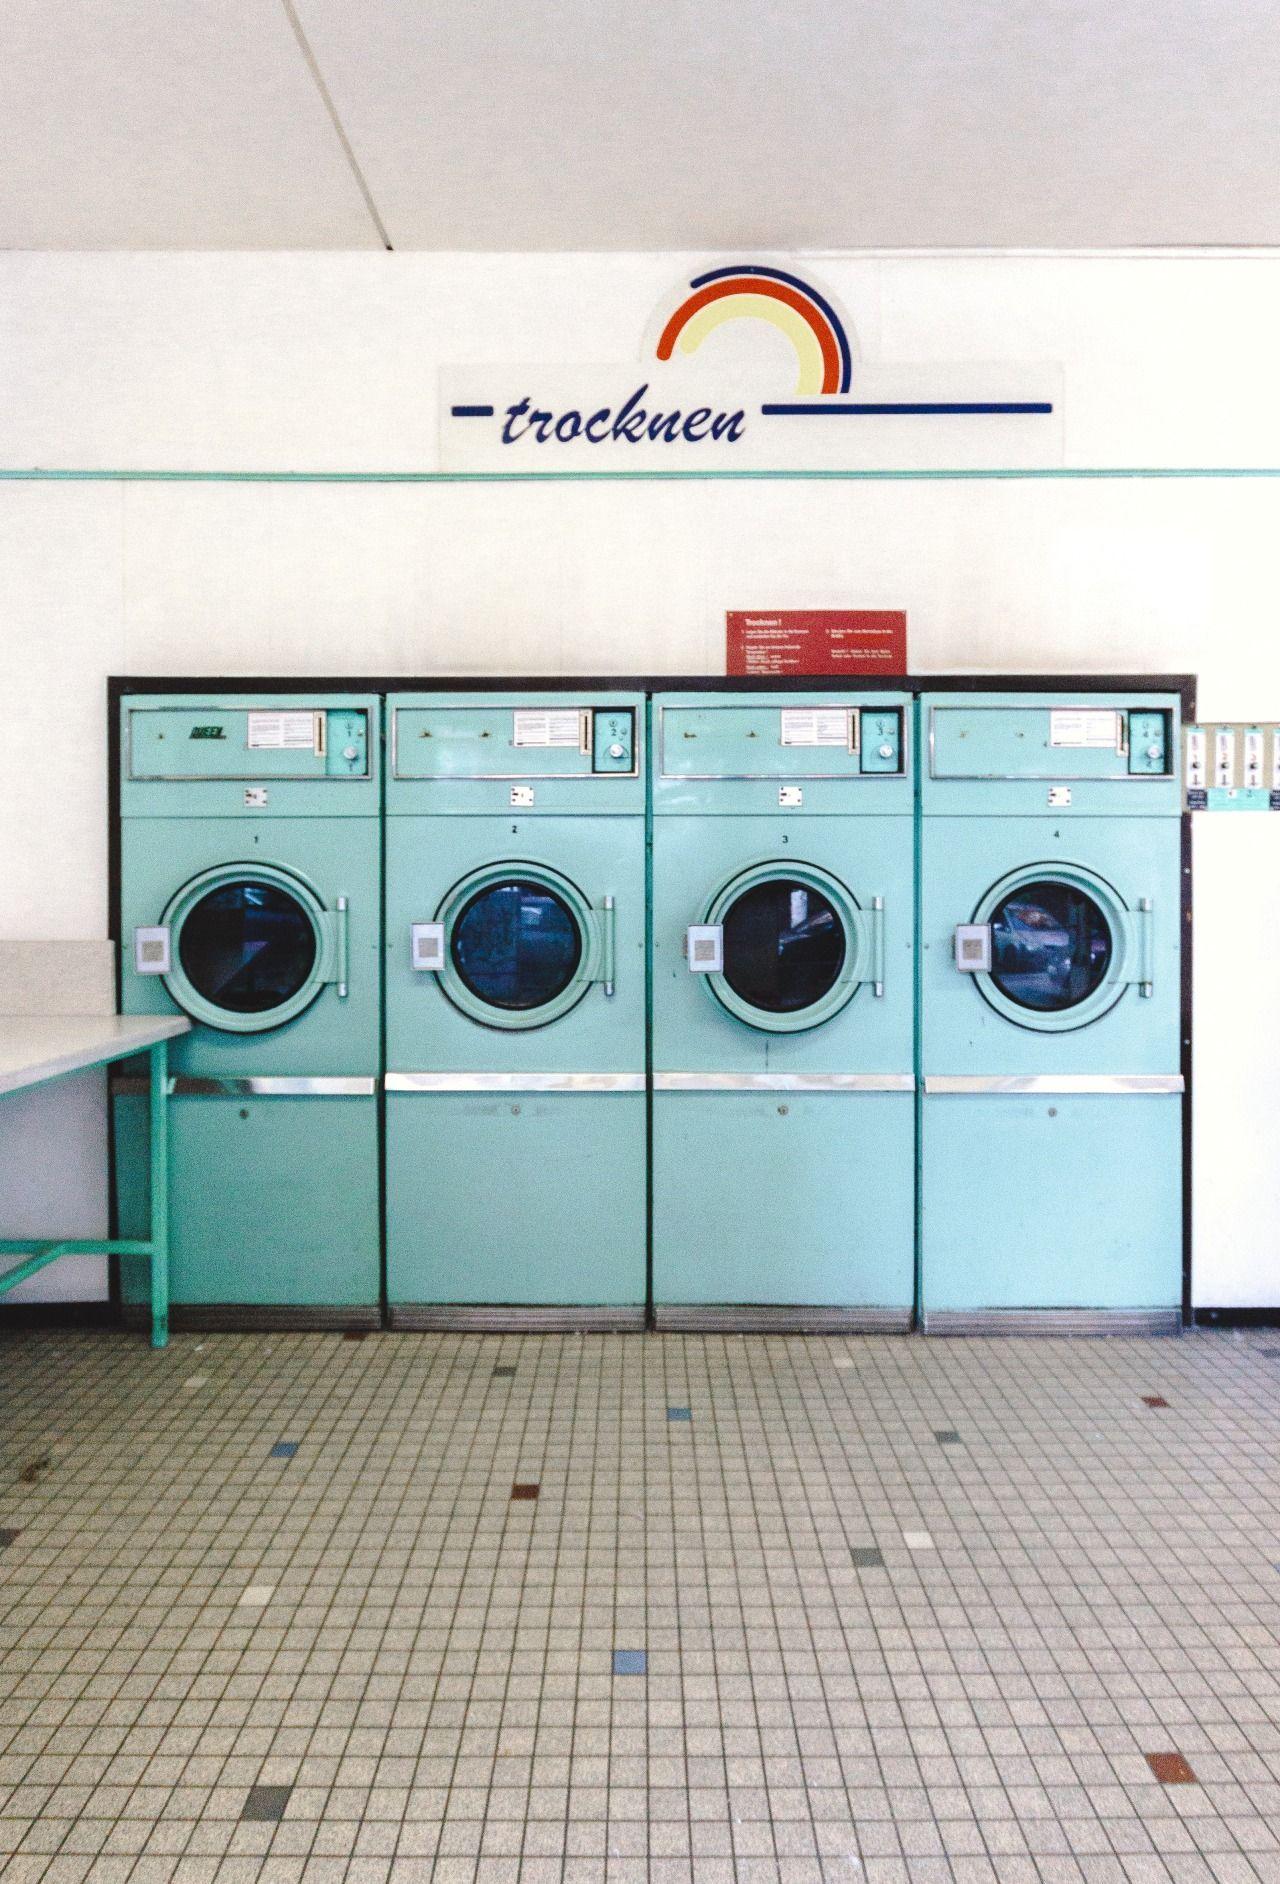 Trocknena Very Retro Laundromat Wascherei Near Our Apartment With Images Laundry Shop Laundromat Laundry Mat